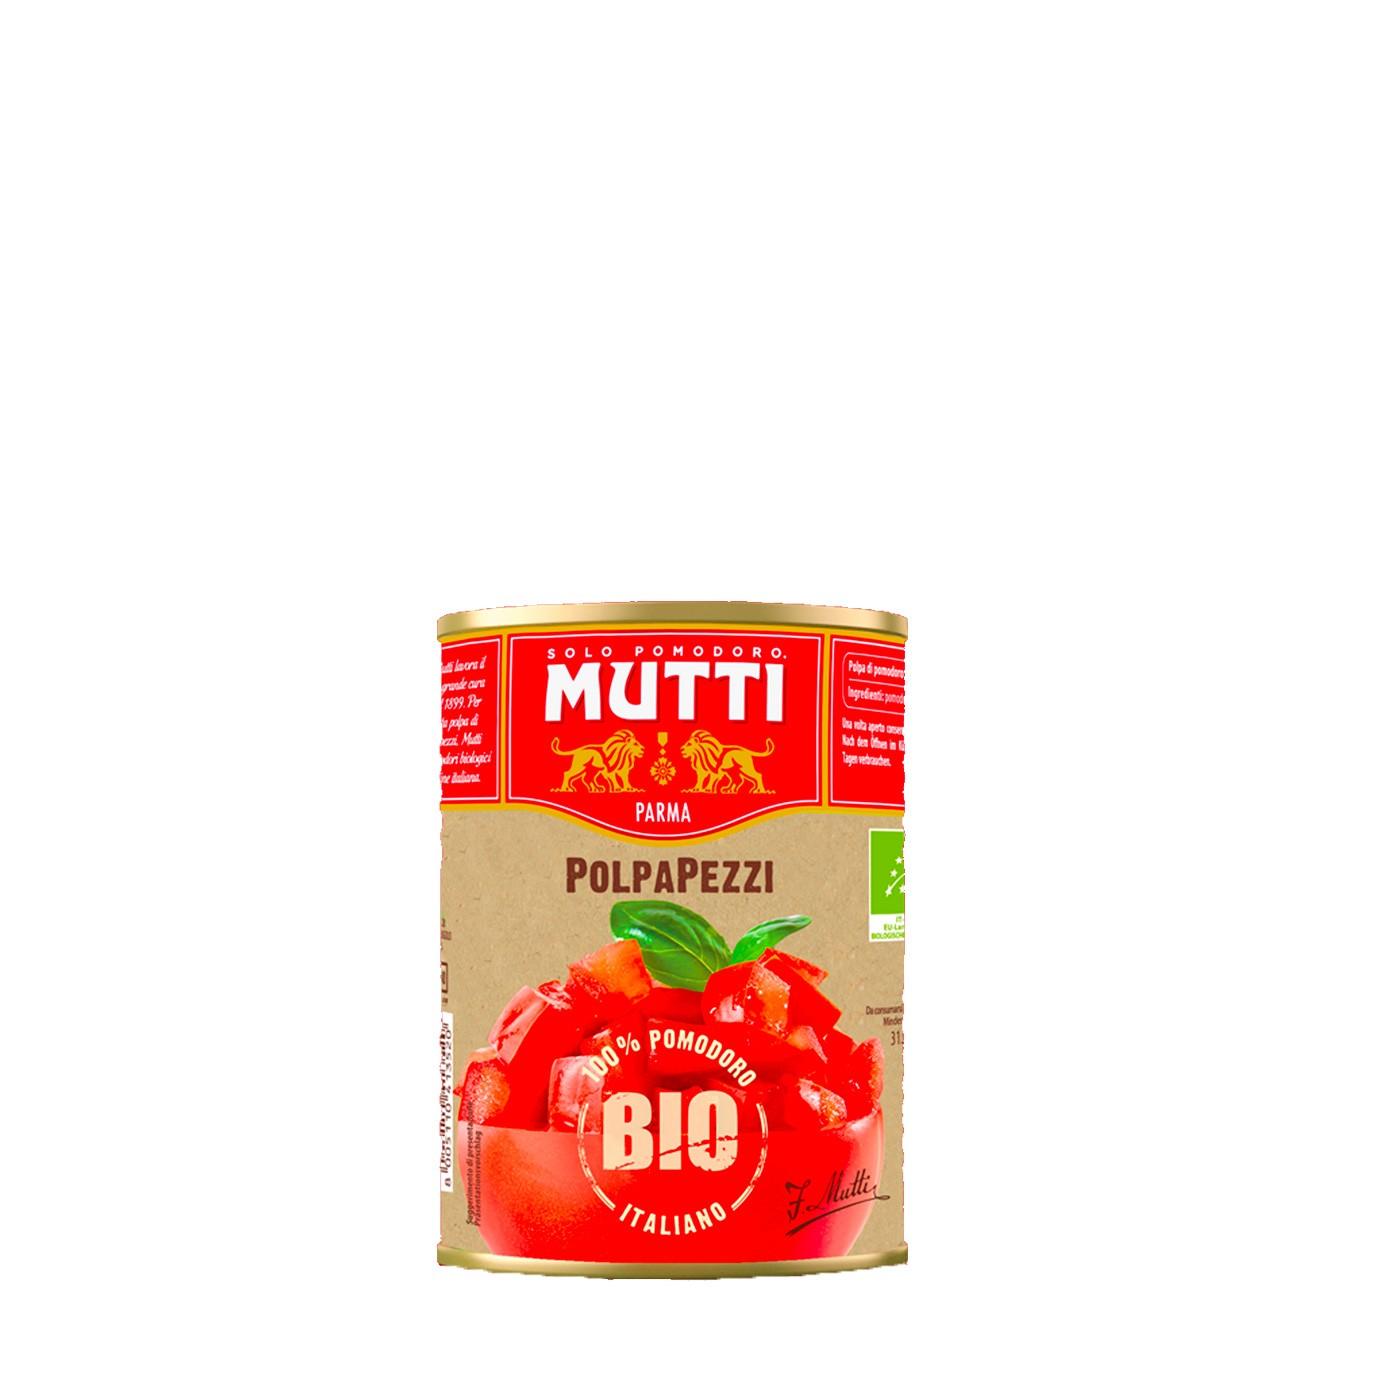 Organic Diced Tomato Pulp 14 oz